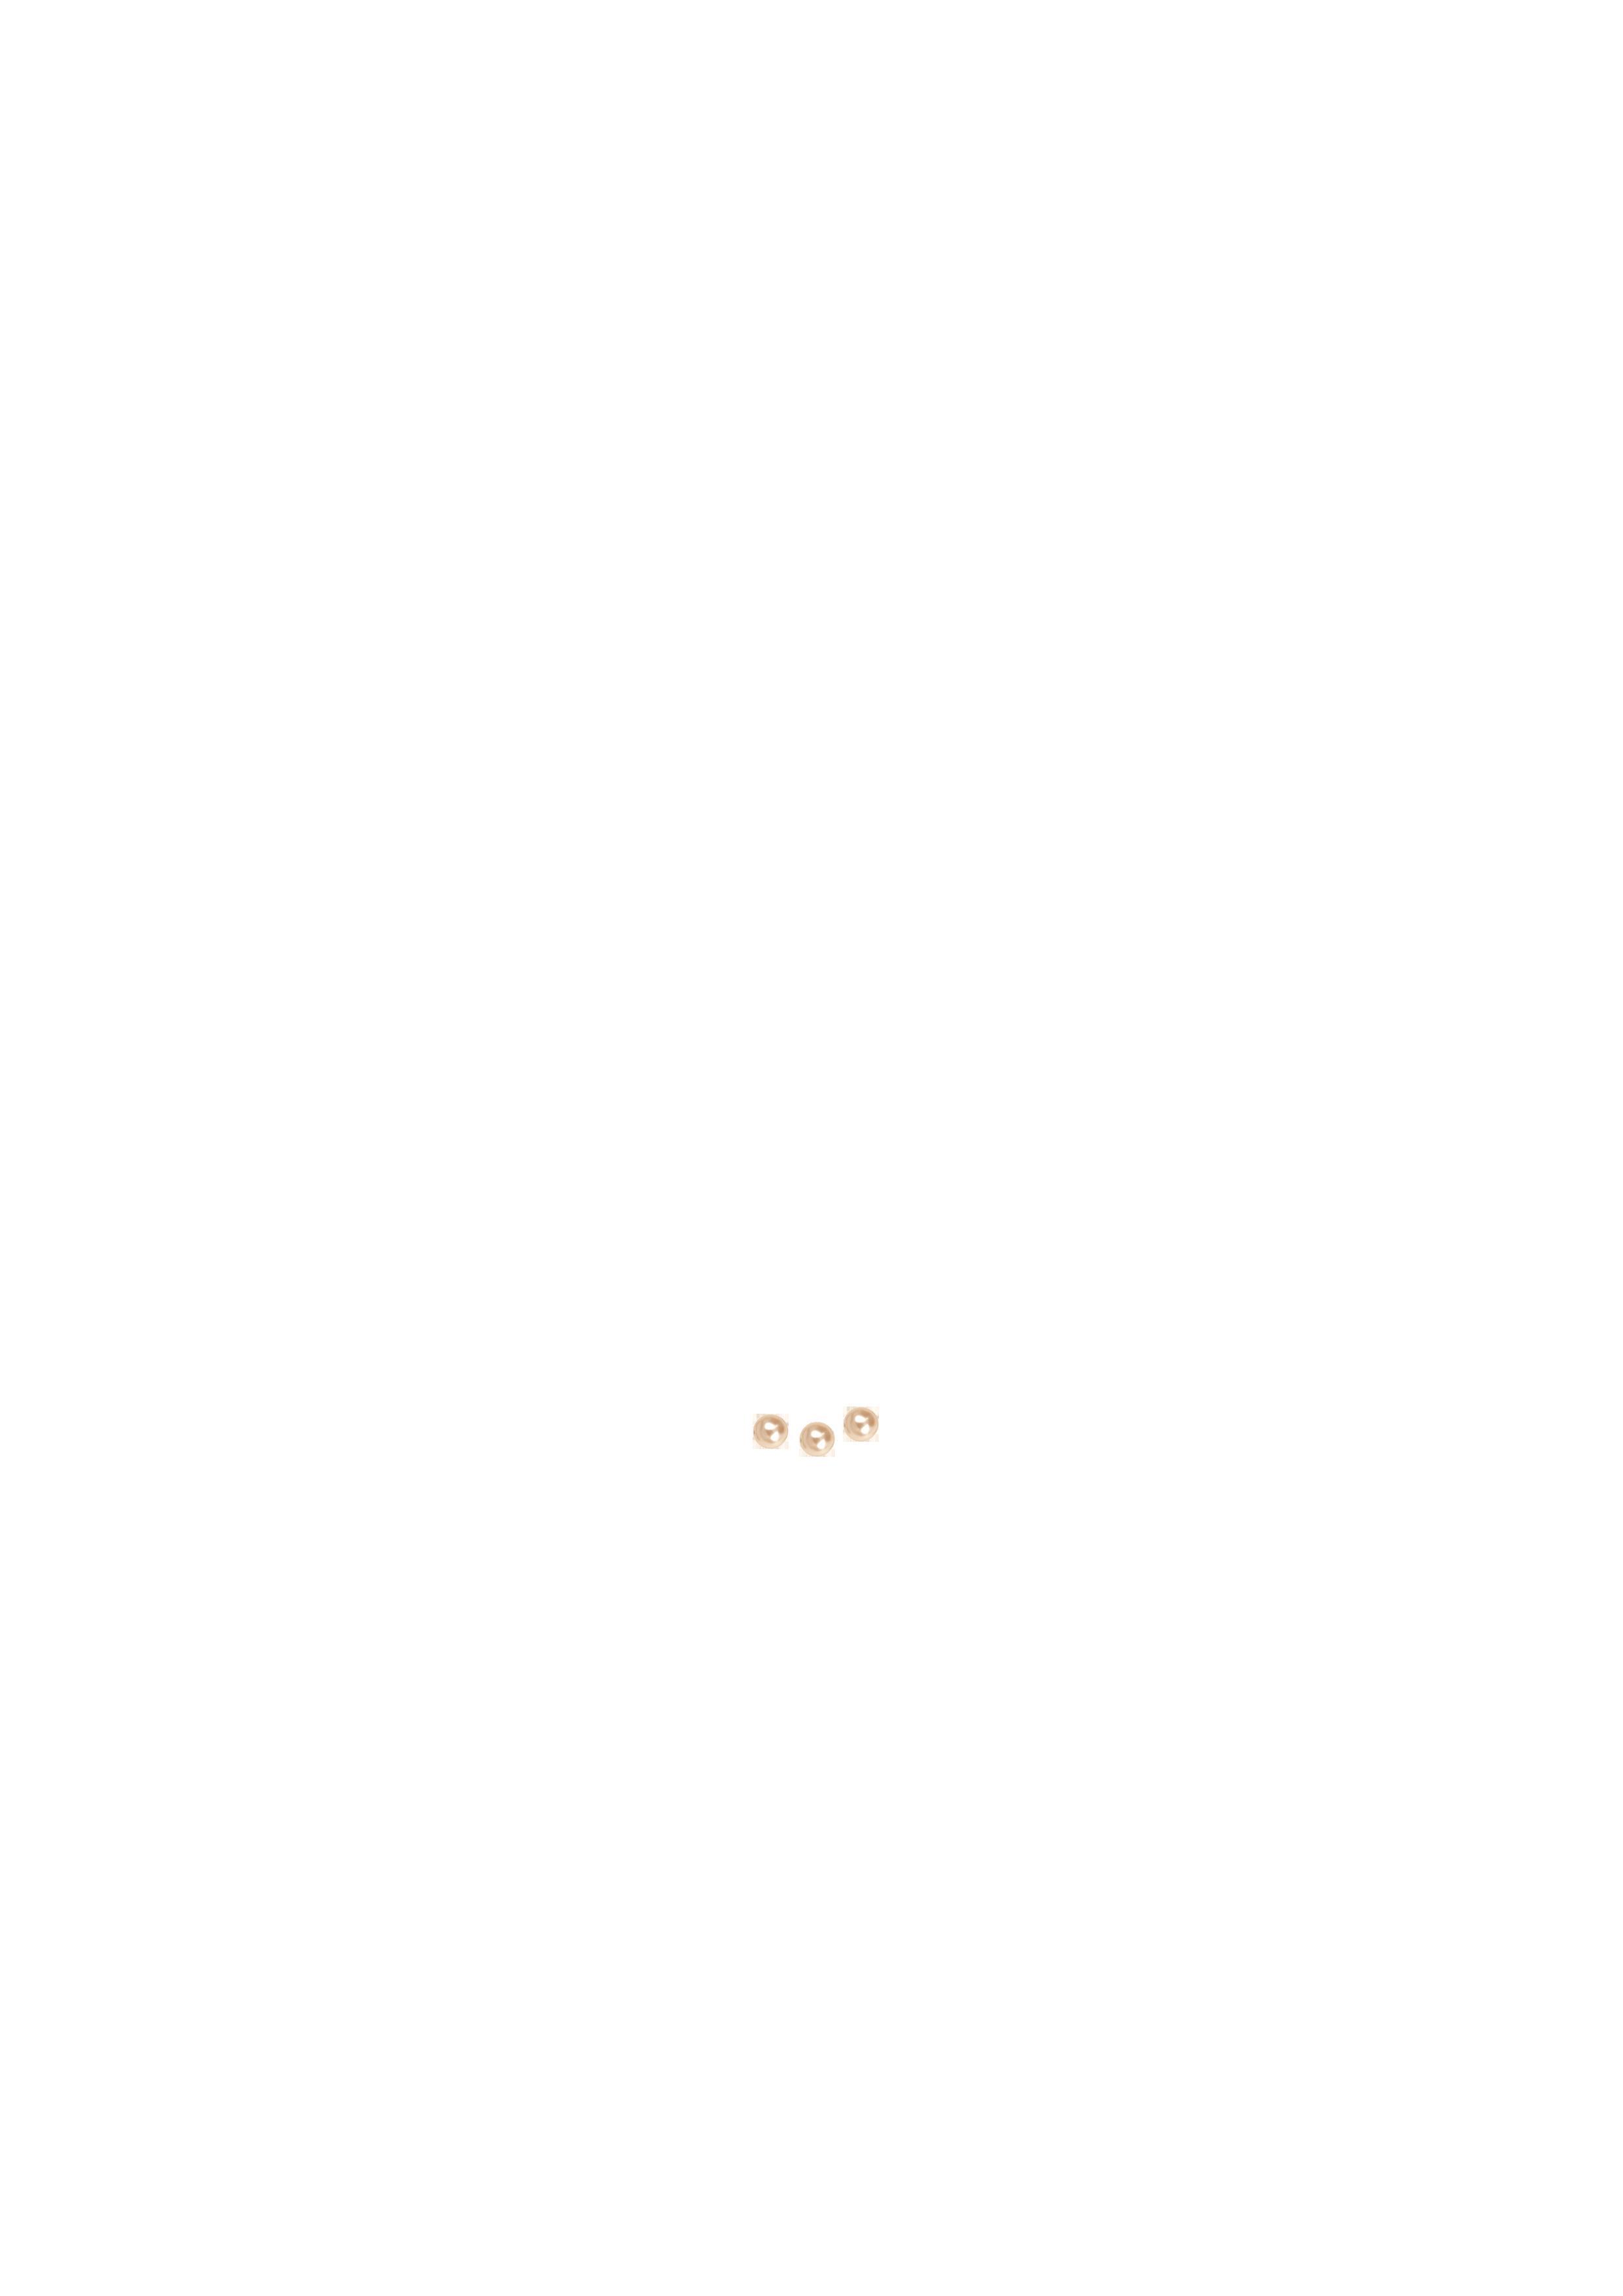 Perles 6mm Swarovski nacrée rose poudré x 3